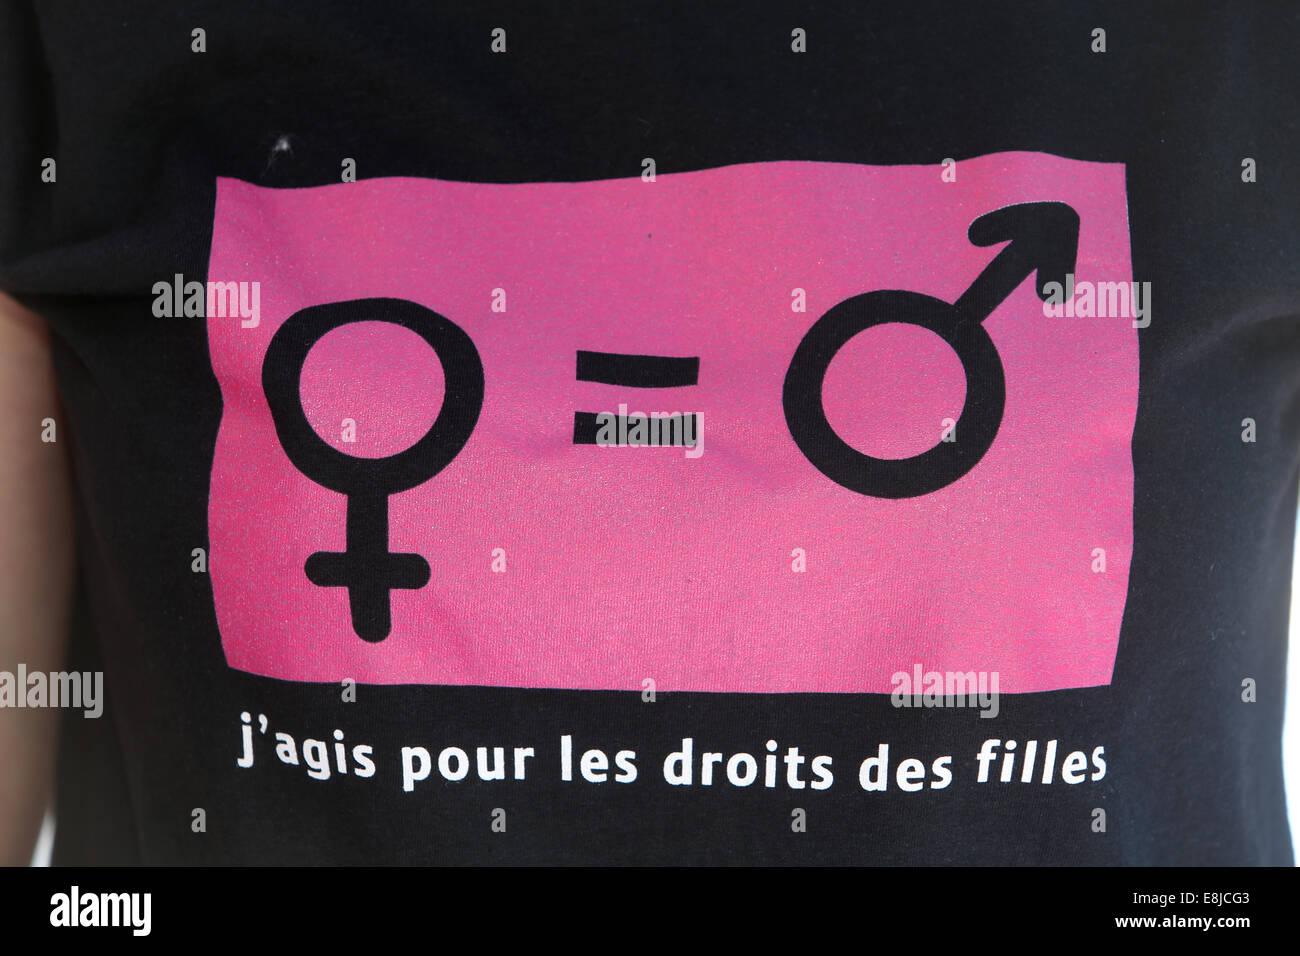 T-shirt : gender equality. Feminism. - Stock Image